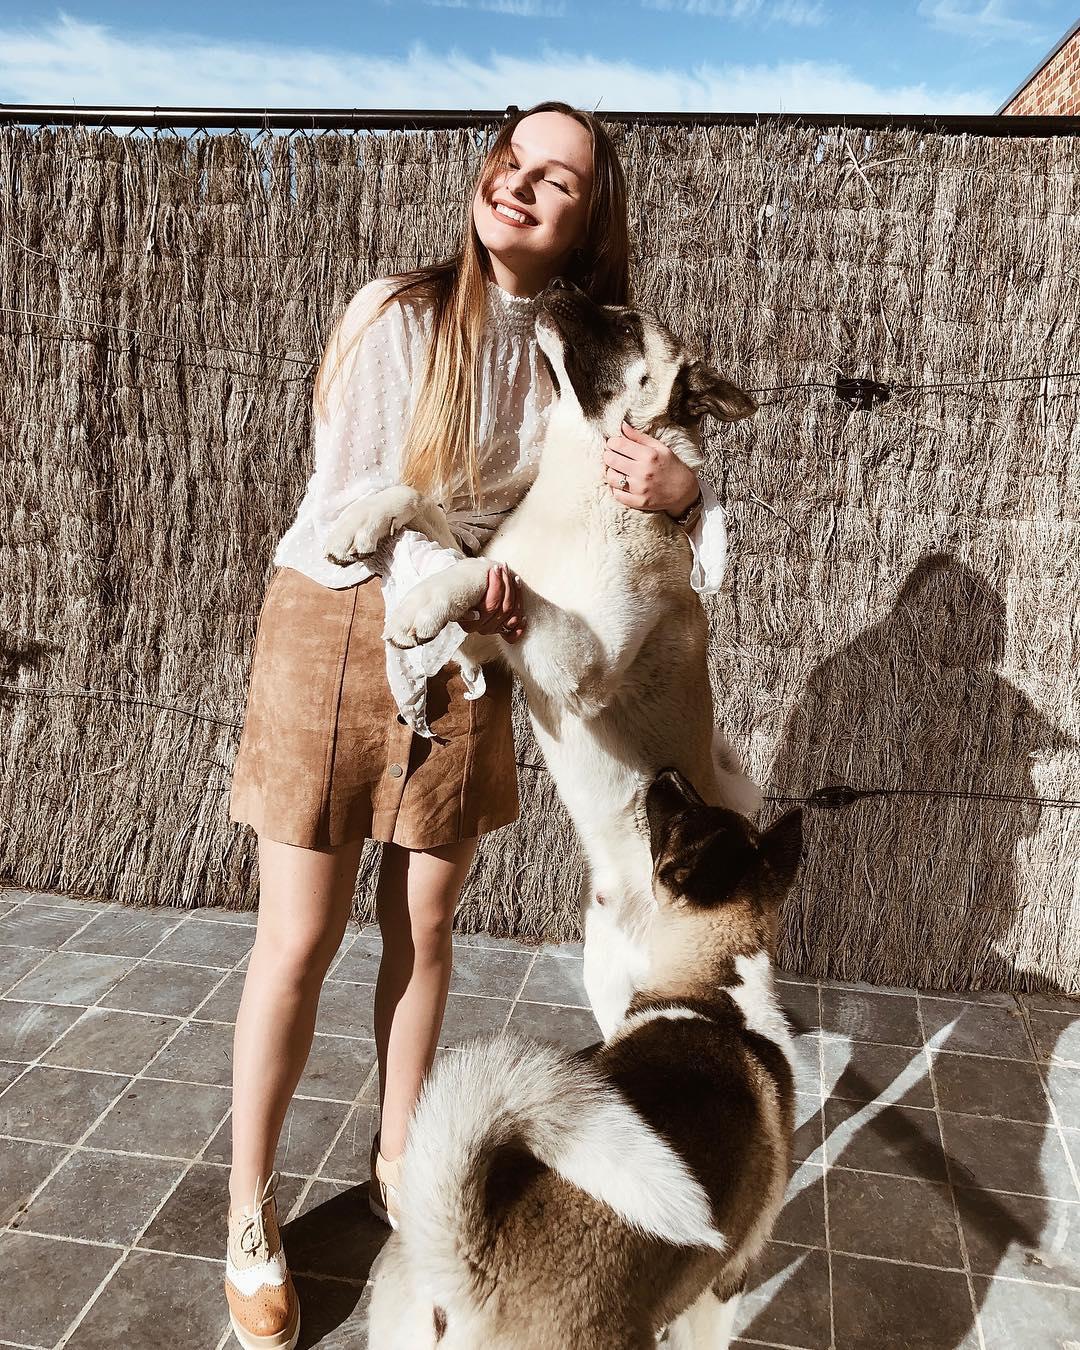 camel sued skirt de Les Bourgeoises sur elodyberteyn